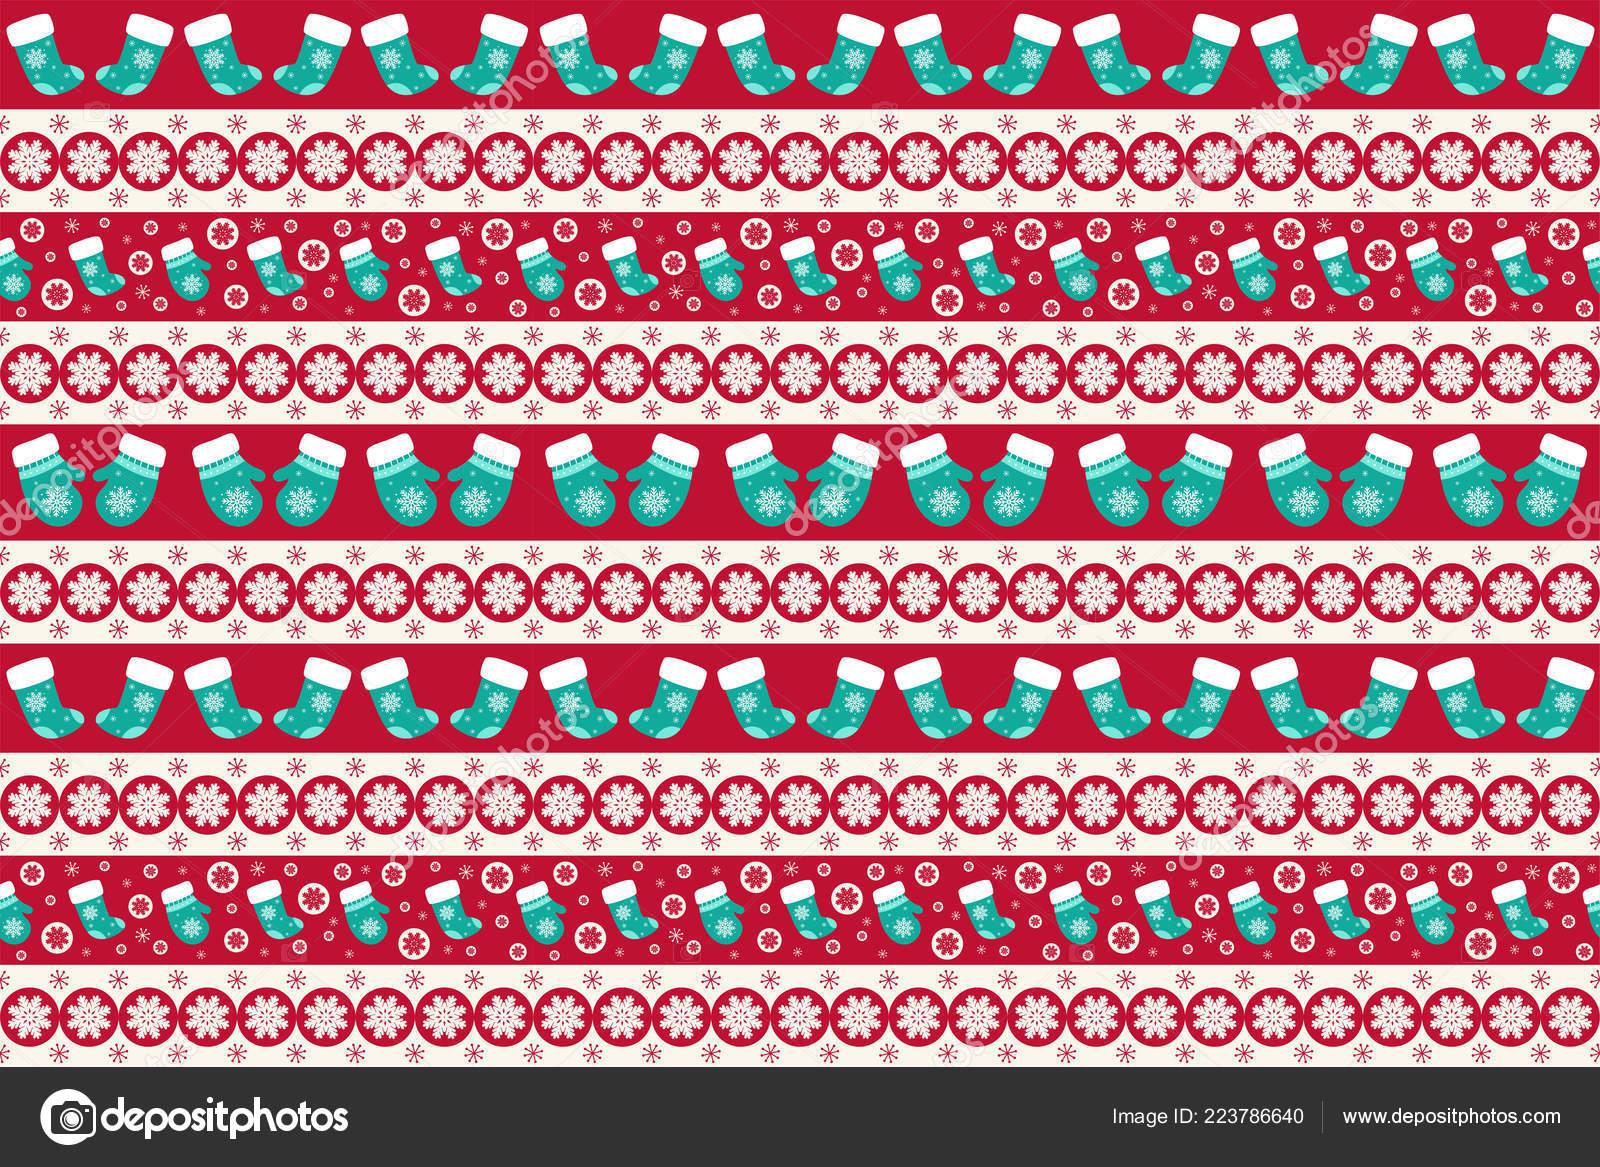 Merry Christmas Pattern Seamless Christmas Wallpaper Endless Texture Gift Wrap Stock Vector C Mokoland 223786640